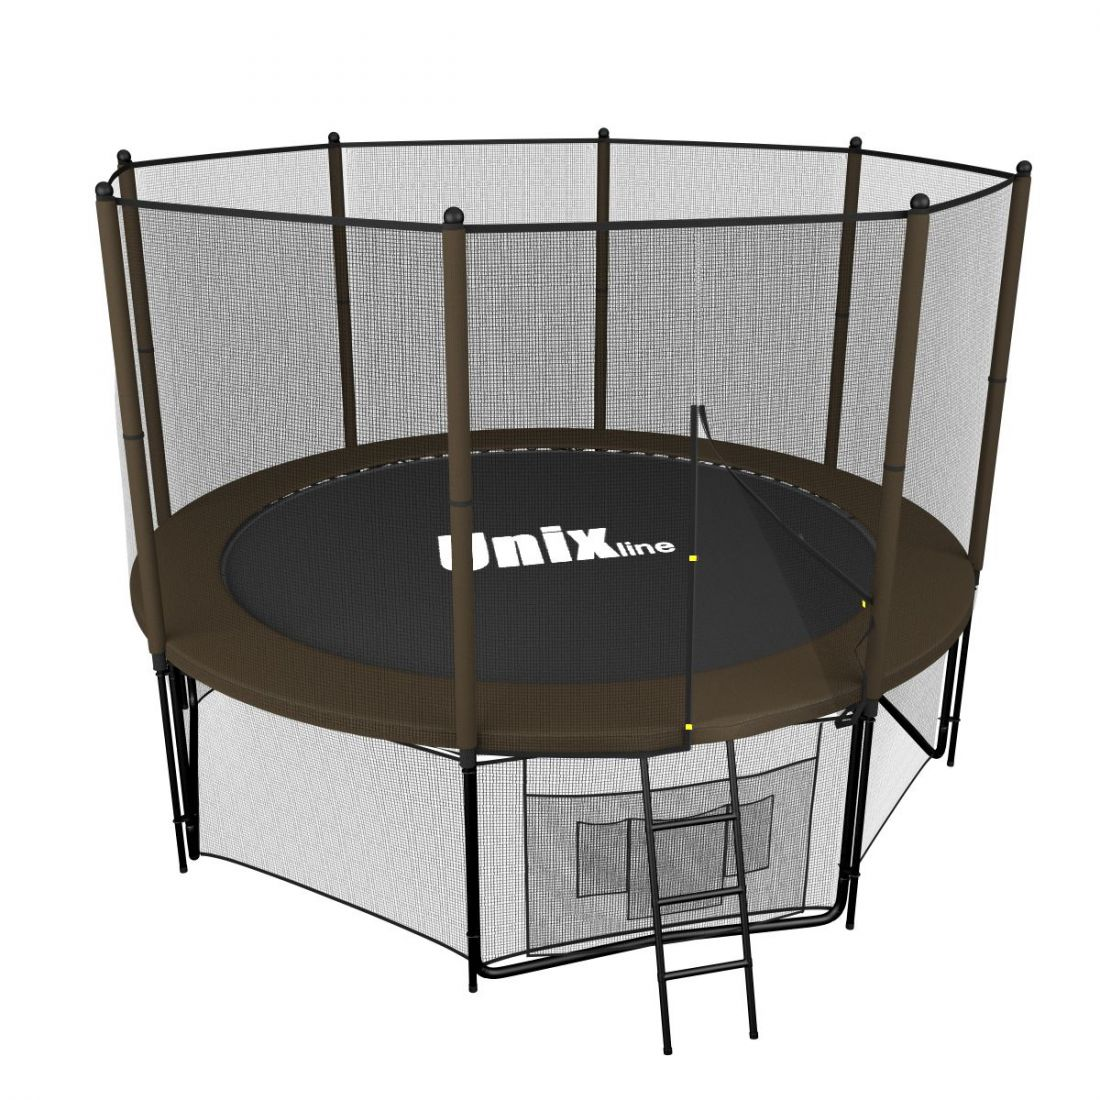 Батут UNIX line 8 ft (2.44 м, до 150 кг) Black&Brown (outside)